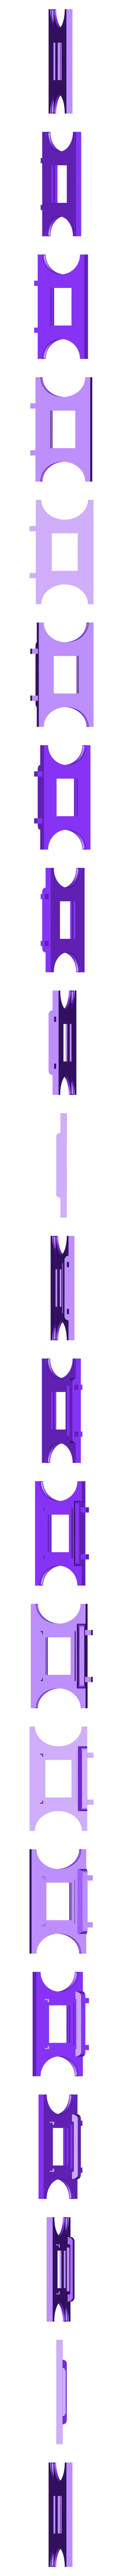 11_porte_diapo.stl Download free STL file Photo copier slides negative super 8 • Template to 3D print, titi01